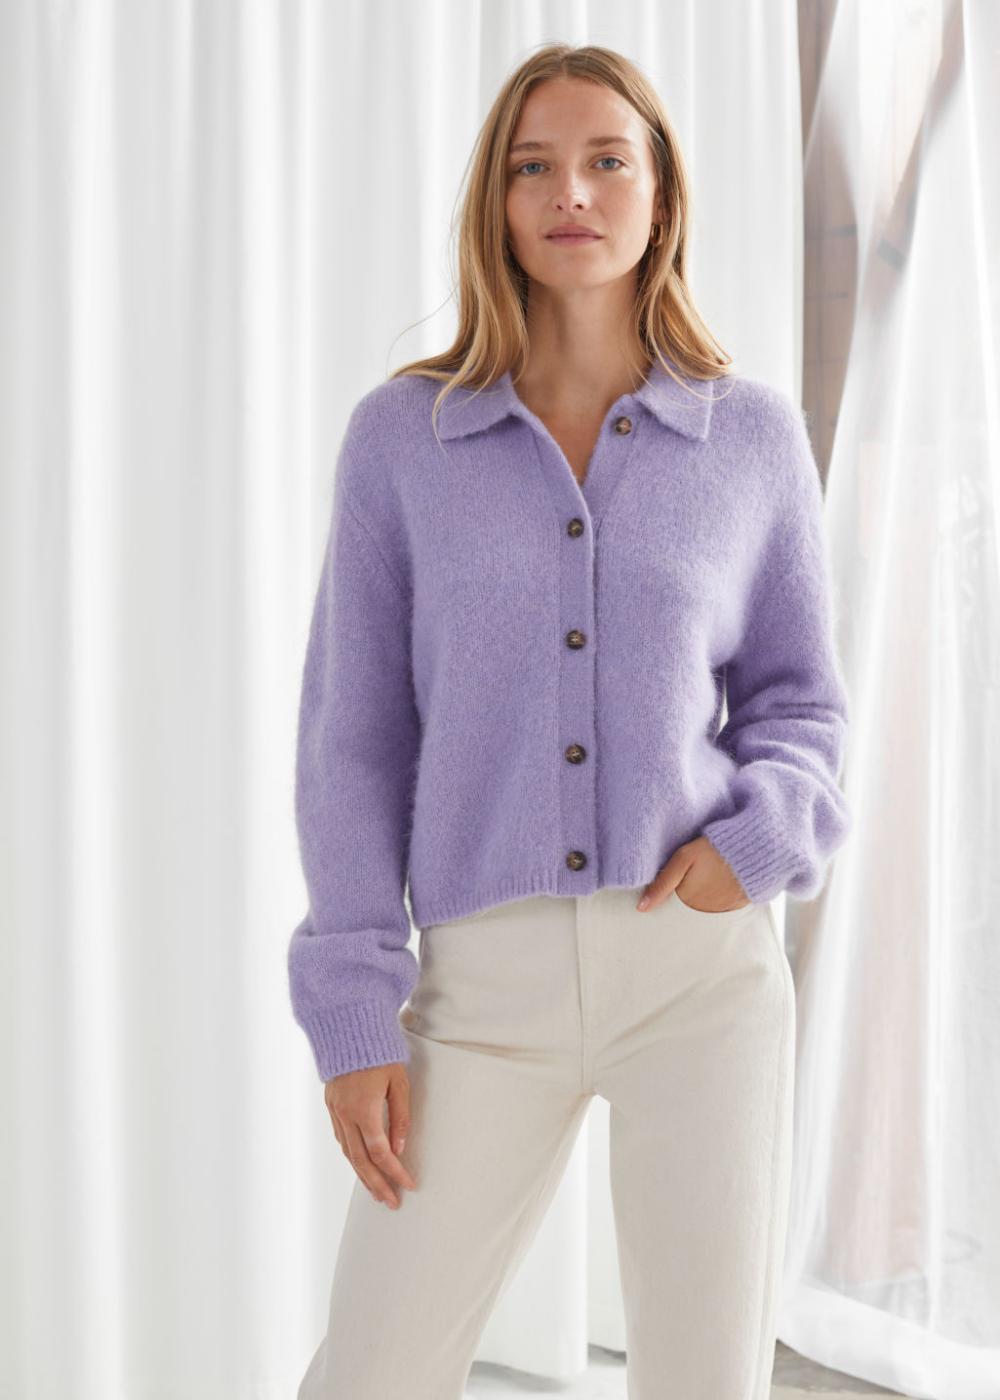 Wool Blend Tortoise Button Cardigan in 2020 | Puff sleeve